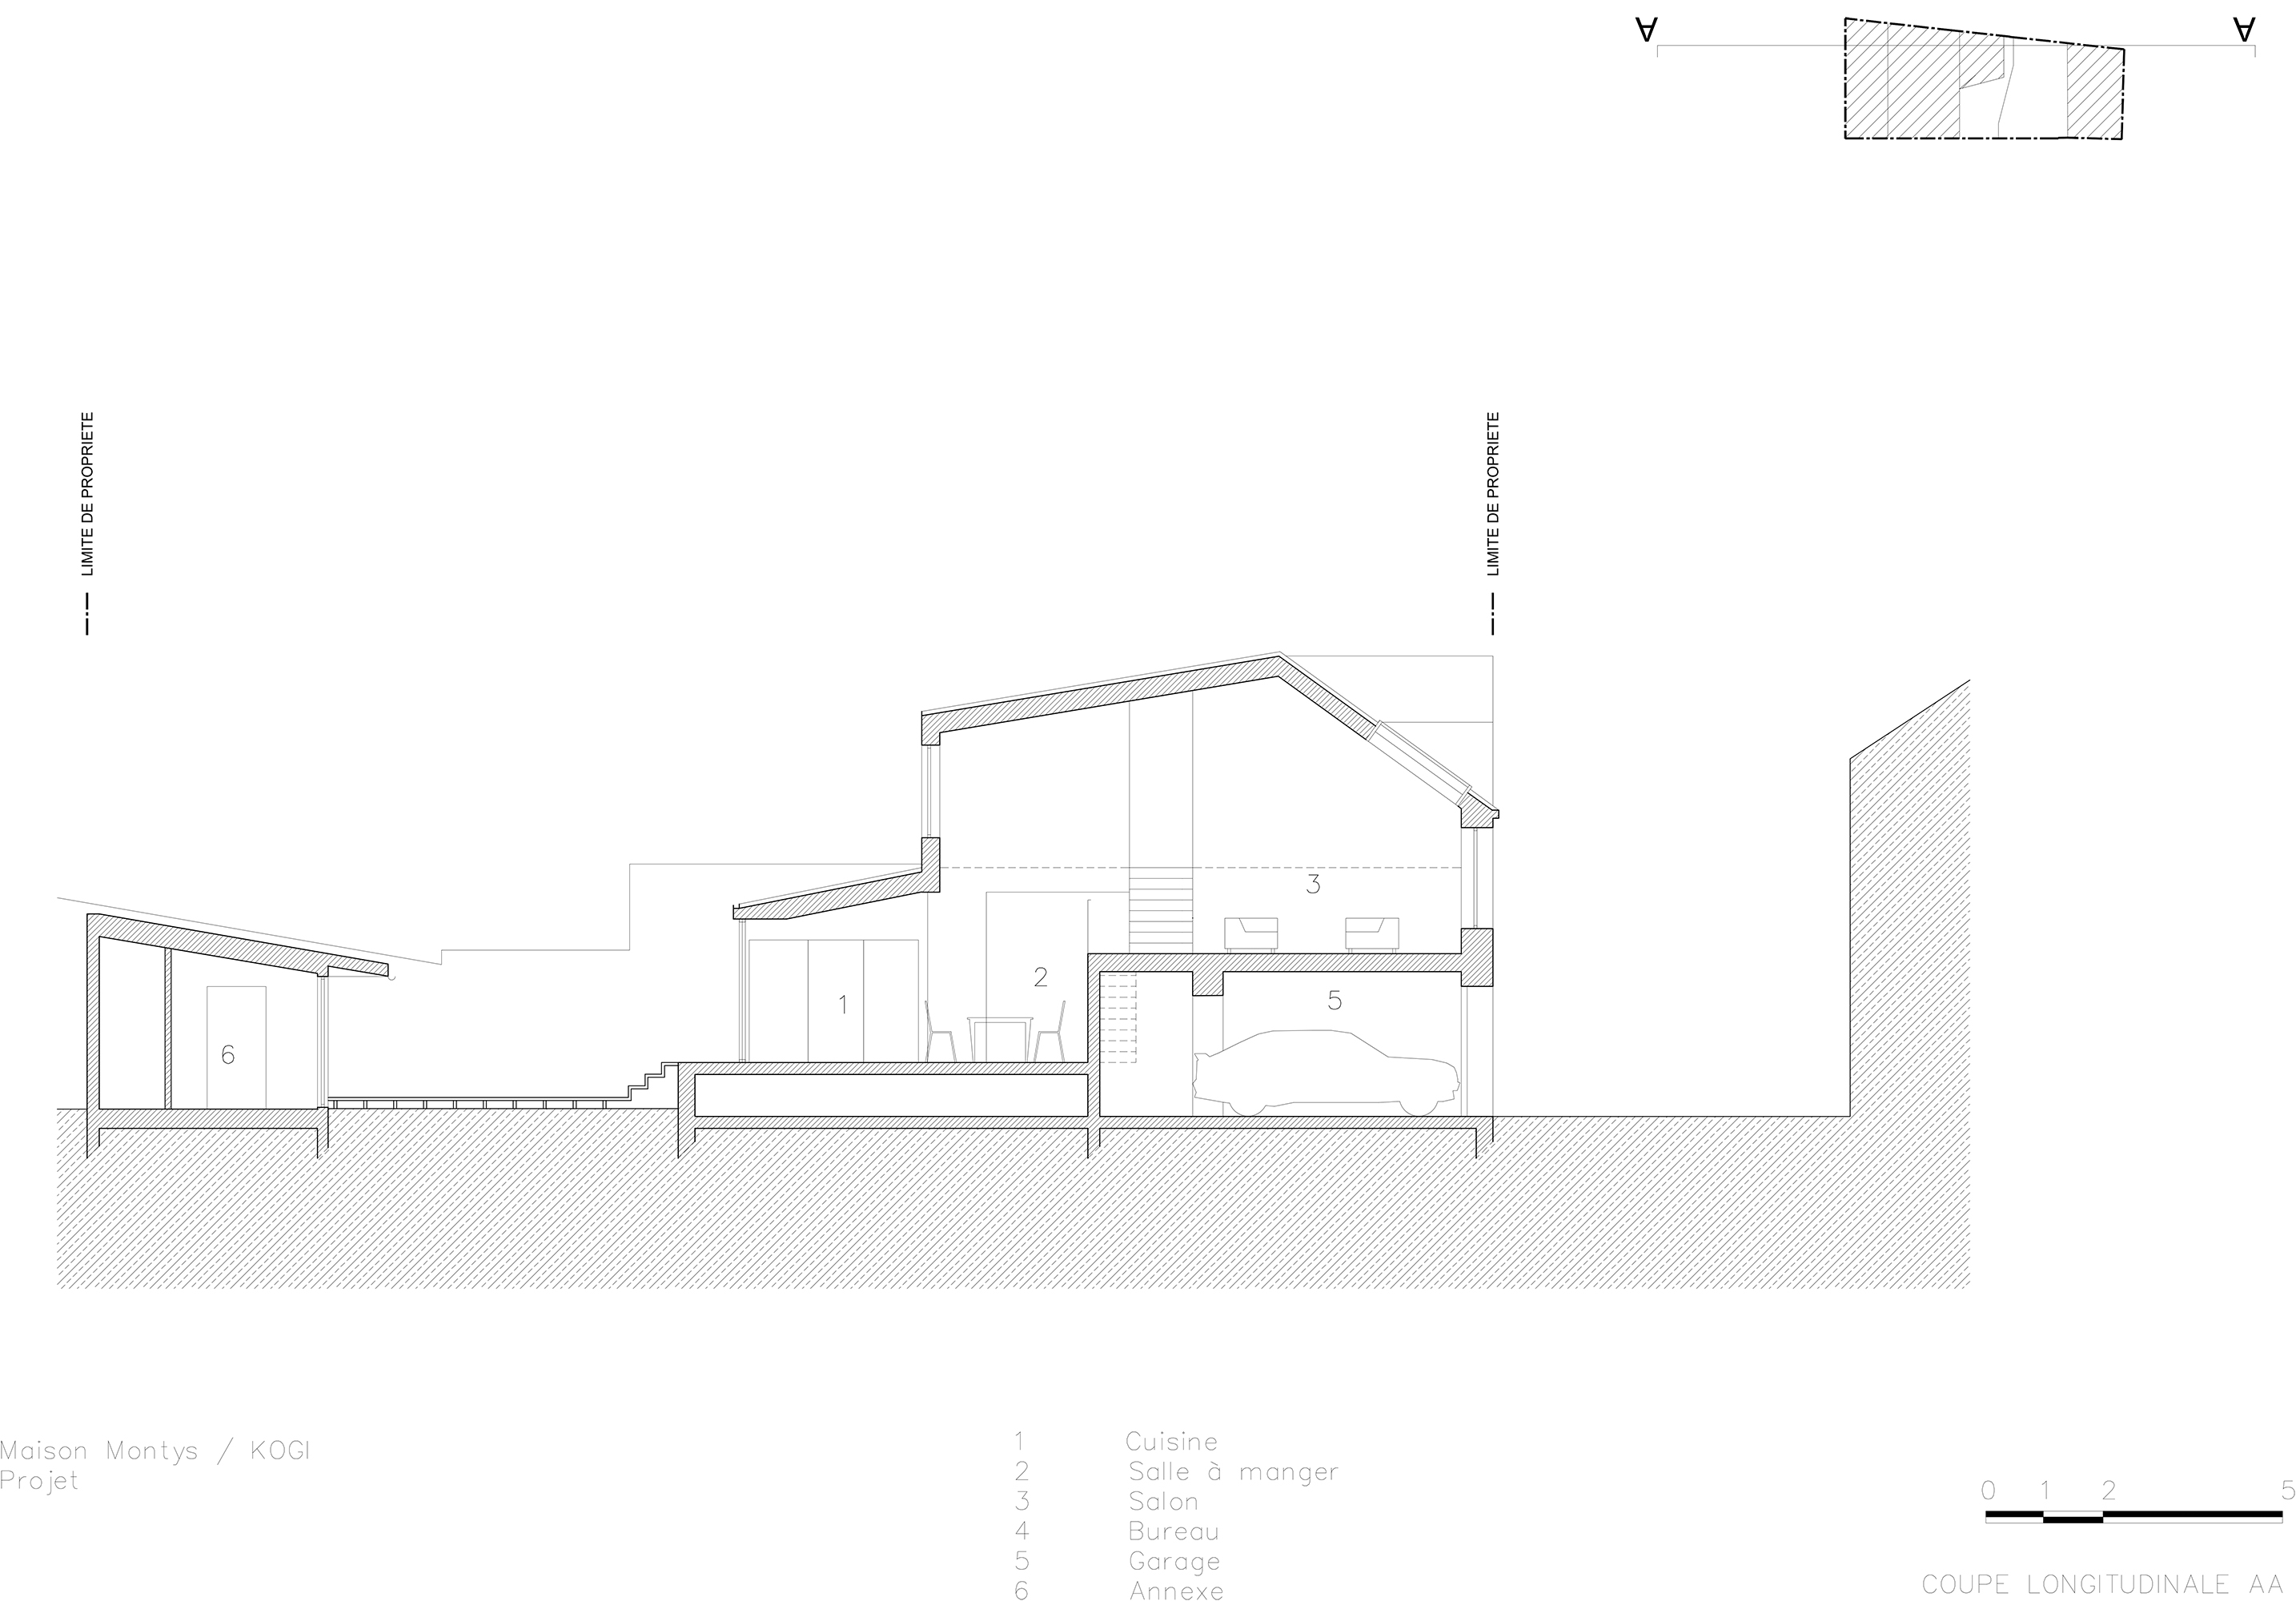 KOGI-Maison Montys - Projet - Coupe AA